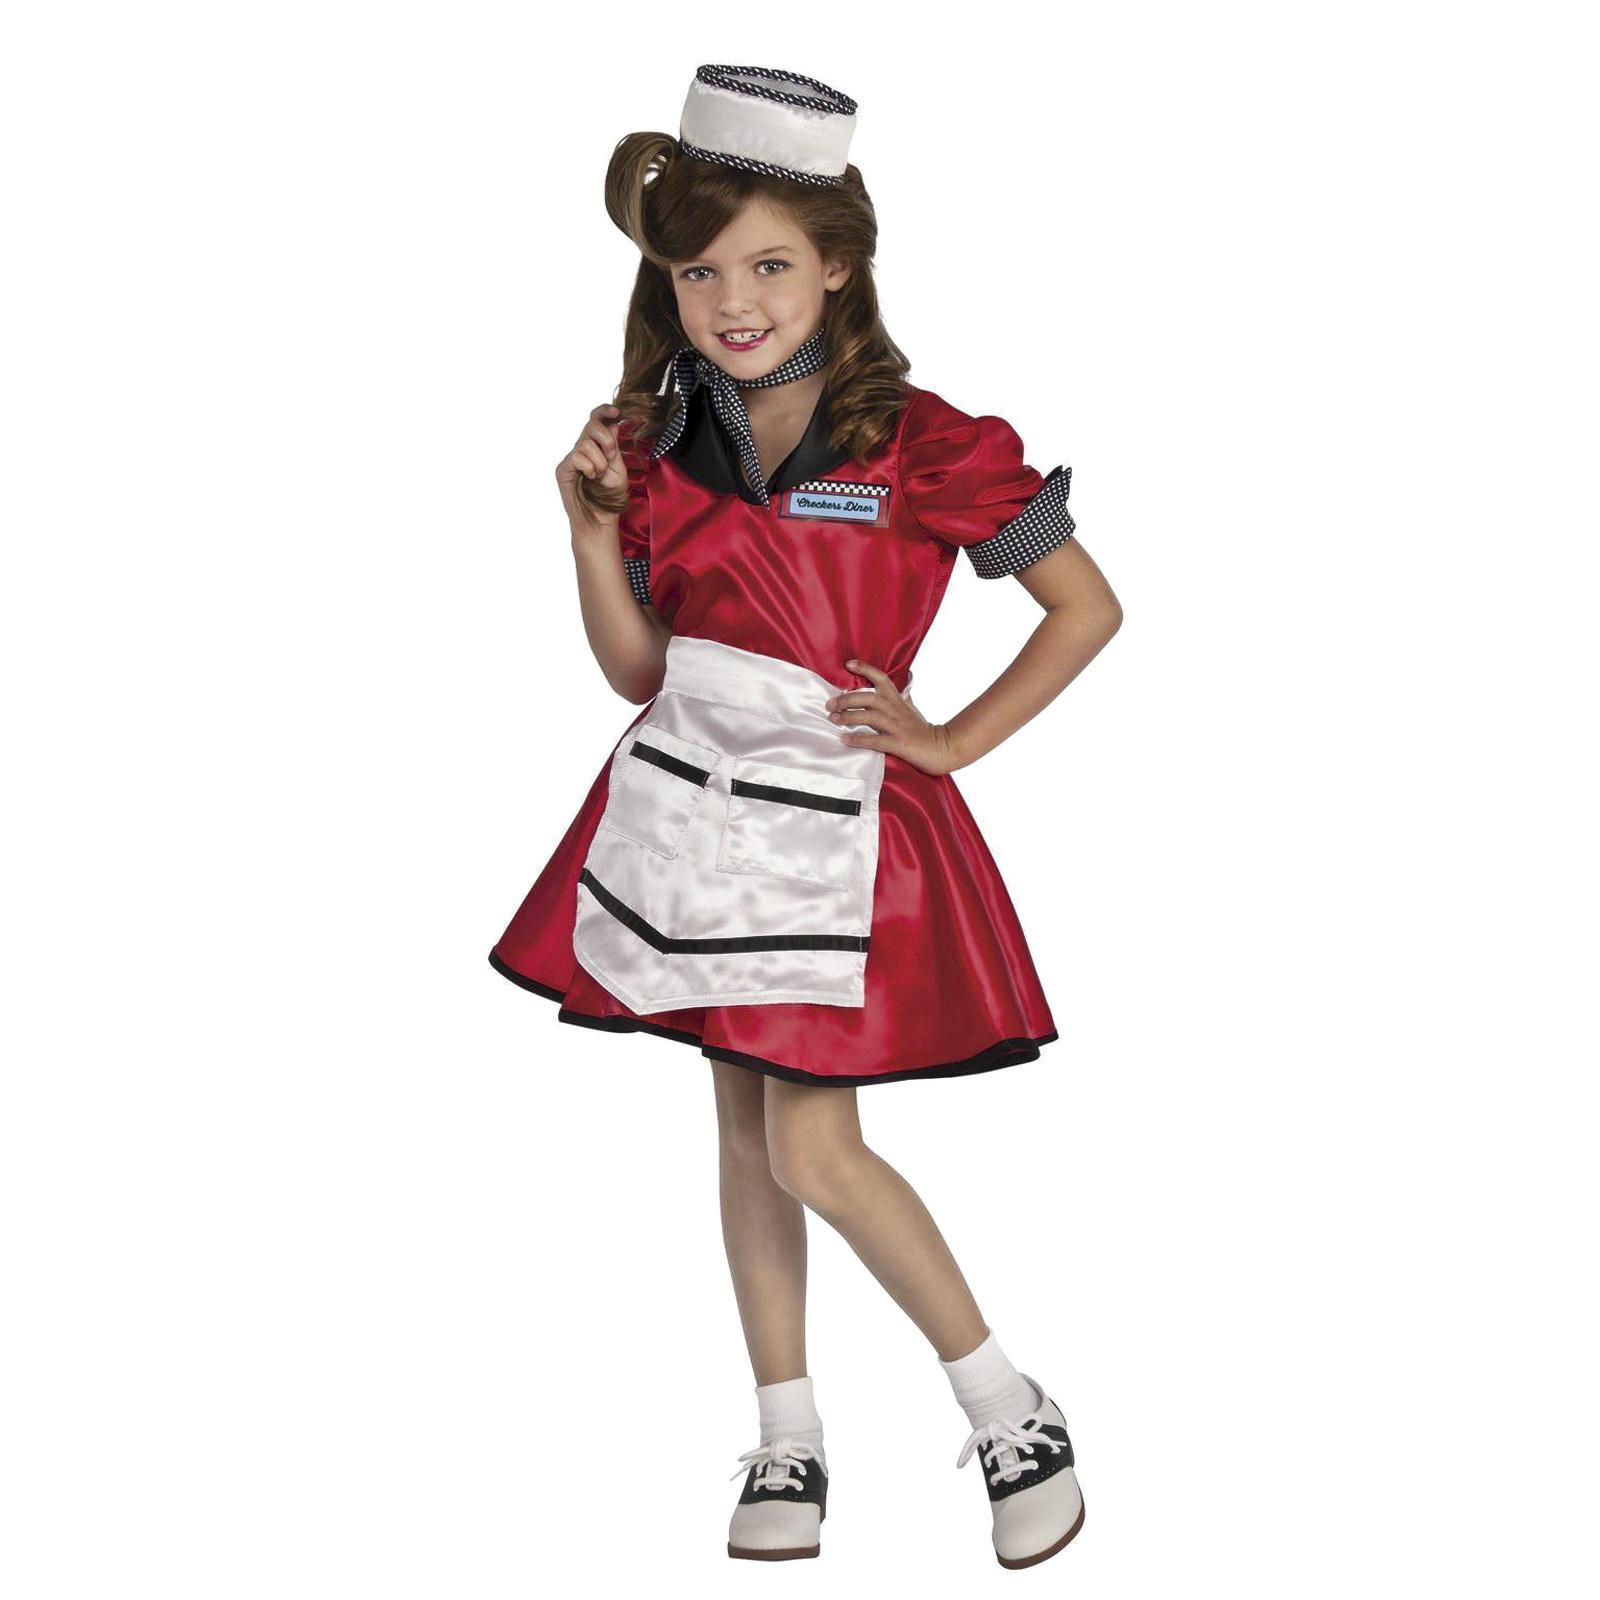 Christmas Decorations Santa Clarita Ca: Child Girl's Retro Diner 1950's Waitress Red Halloween